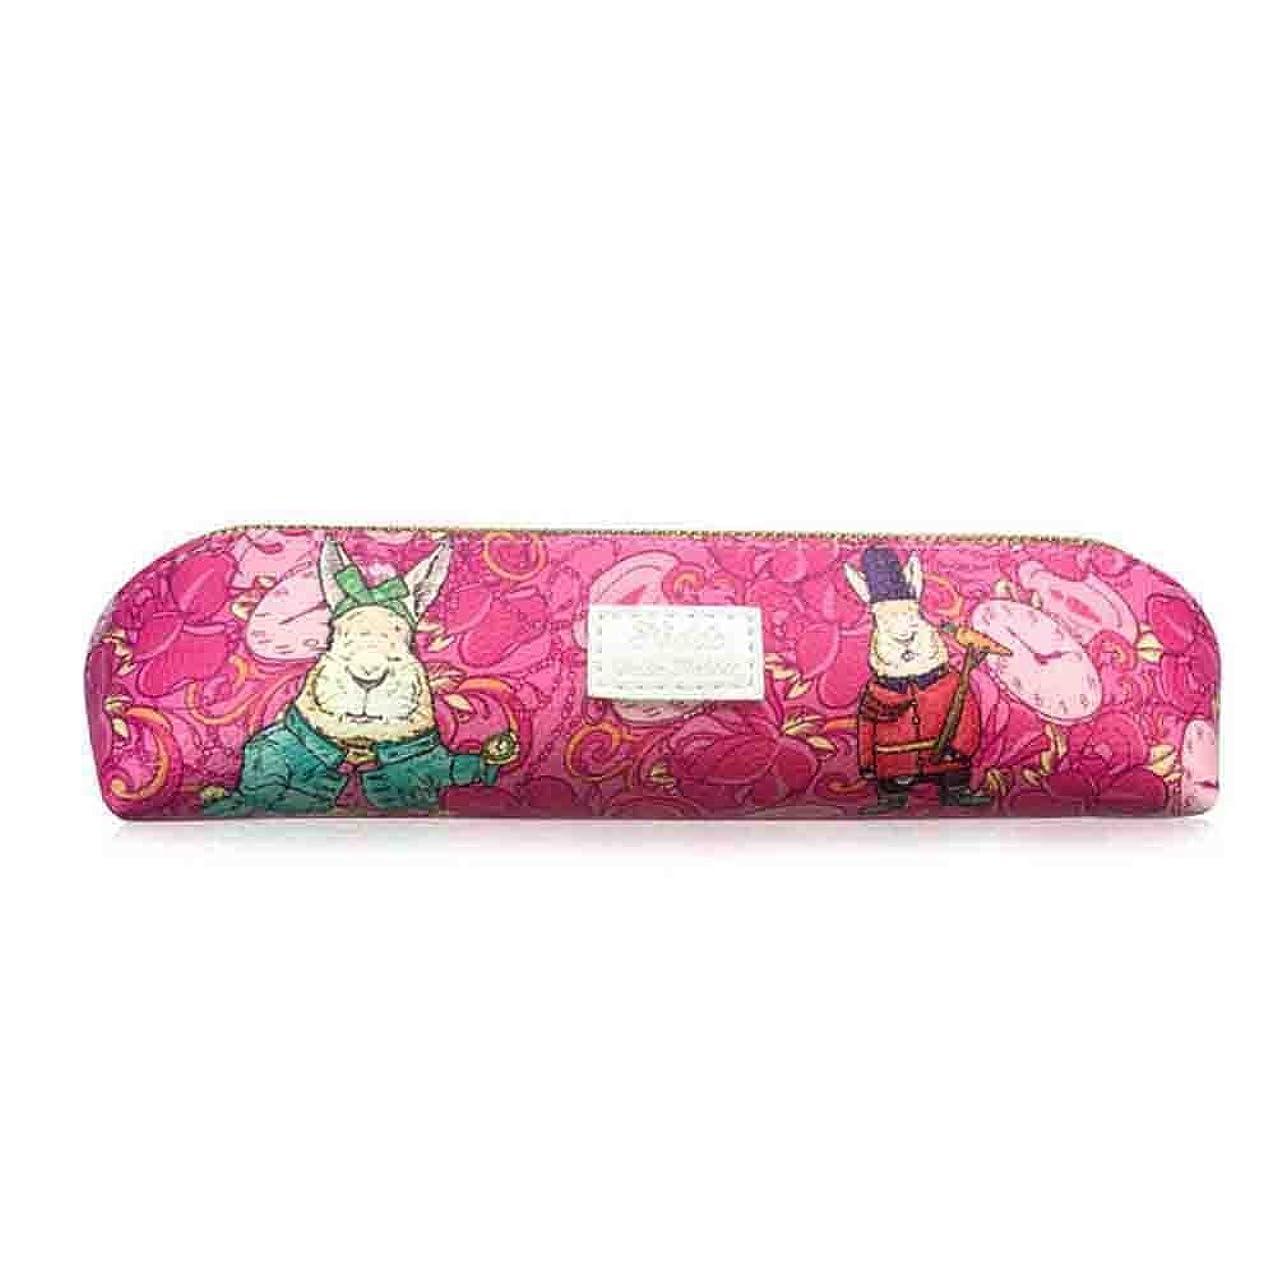 Labon's Pen Pencil Organizer Case Stationery Pouch Bag Coin Purse Pouch Case Cosmetic Makeup Bag (Pink Rabbit)